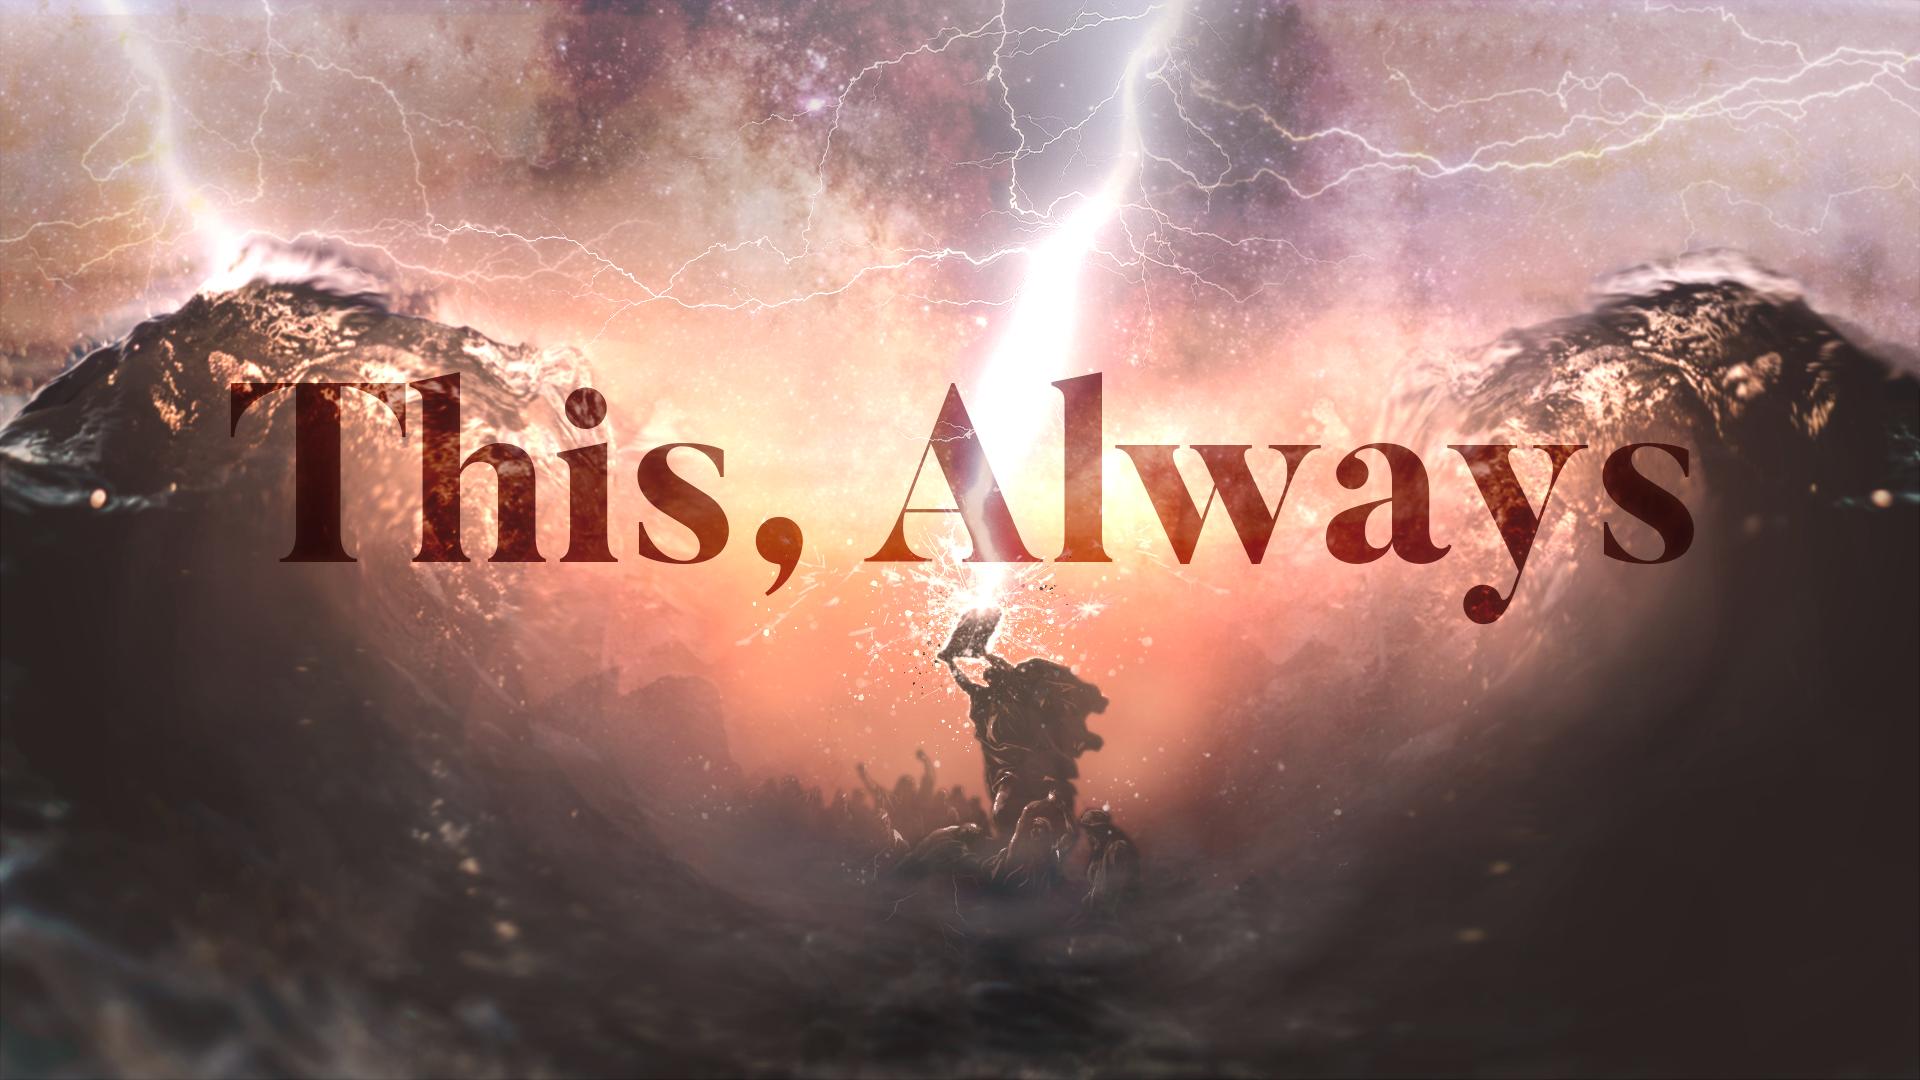 This, Always